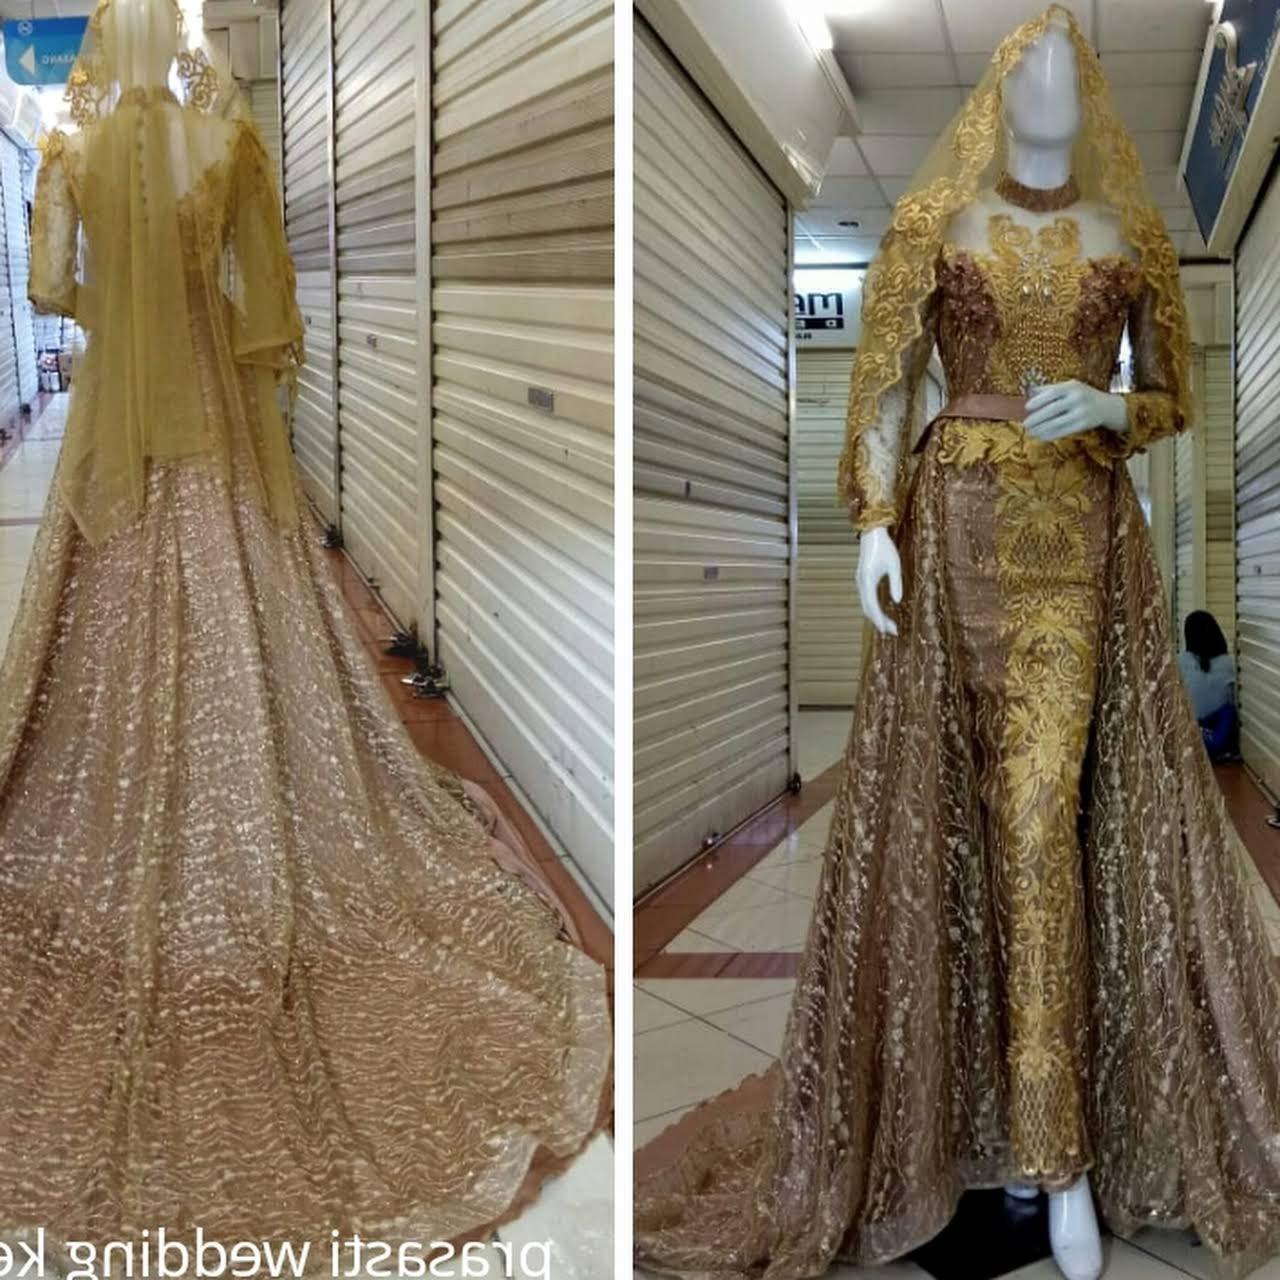 Model Sewa Baju Pengantin Muslimah Modern 9ddf Gaun Kebaya Pengantin Muslimah Hijab Syari Layanan Belanja